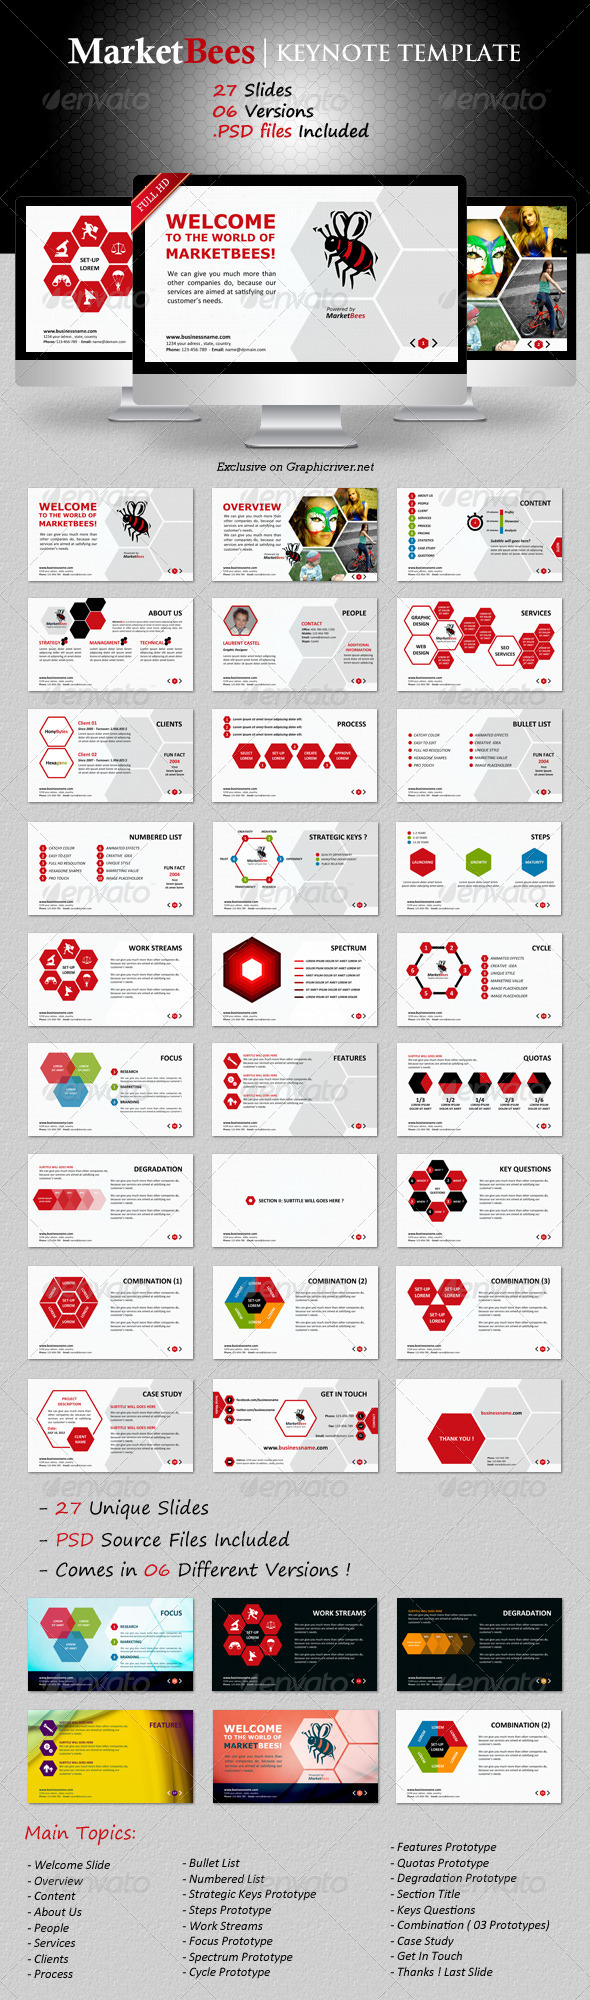 Marketbees Keynote Template - Business Keynote Templates